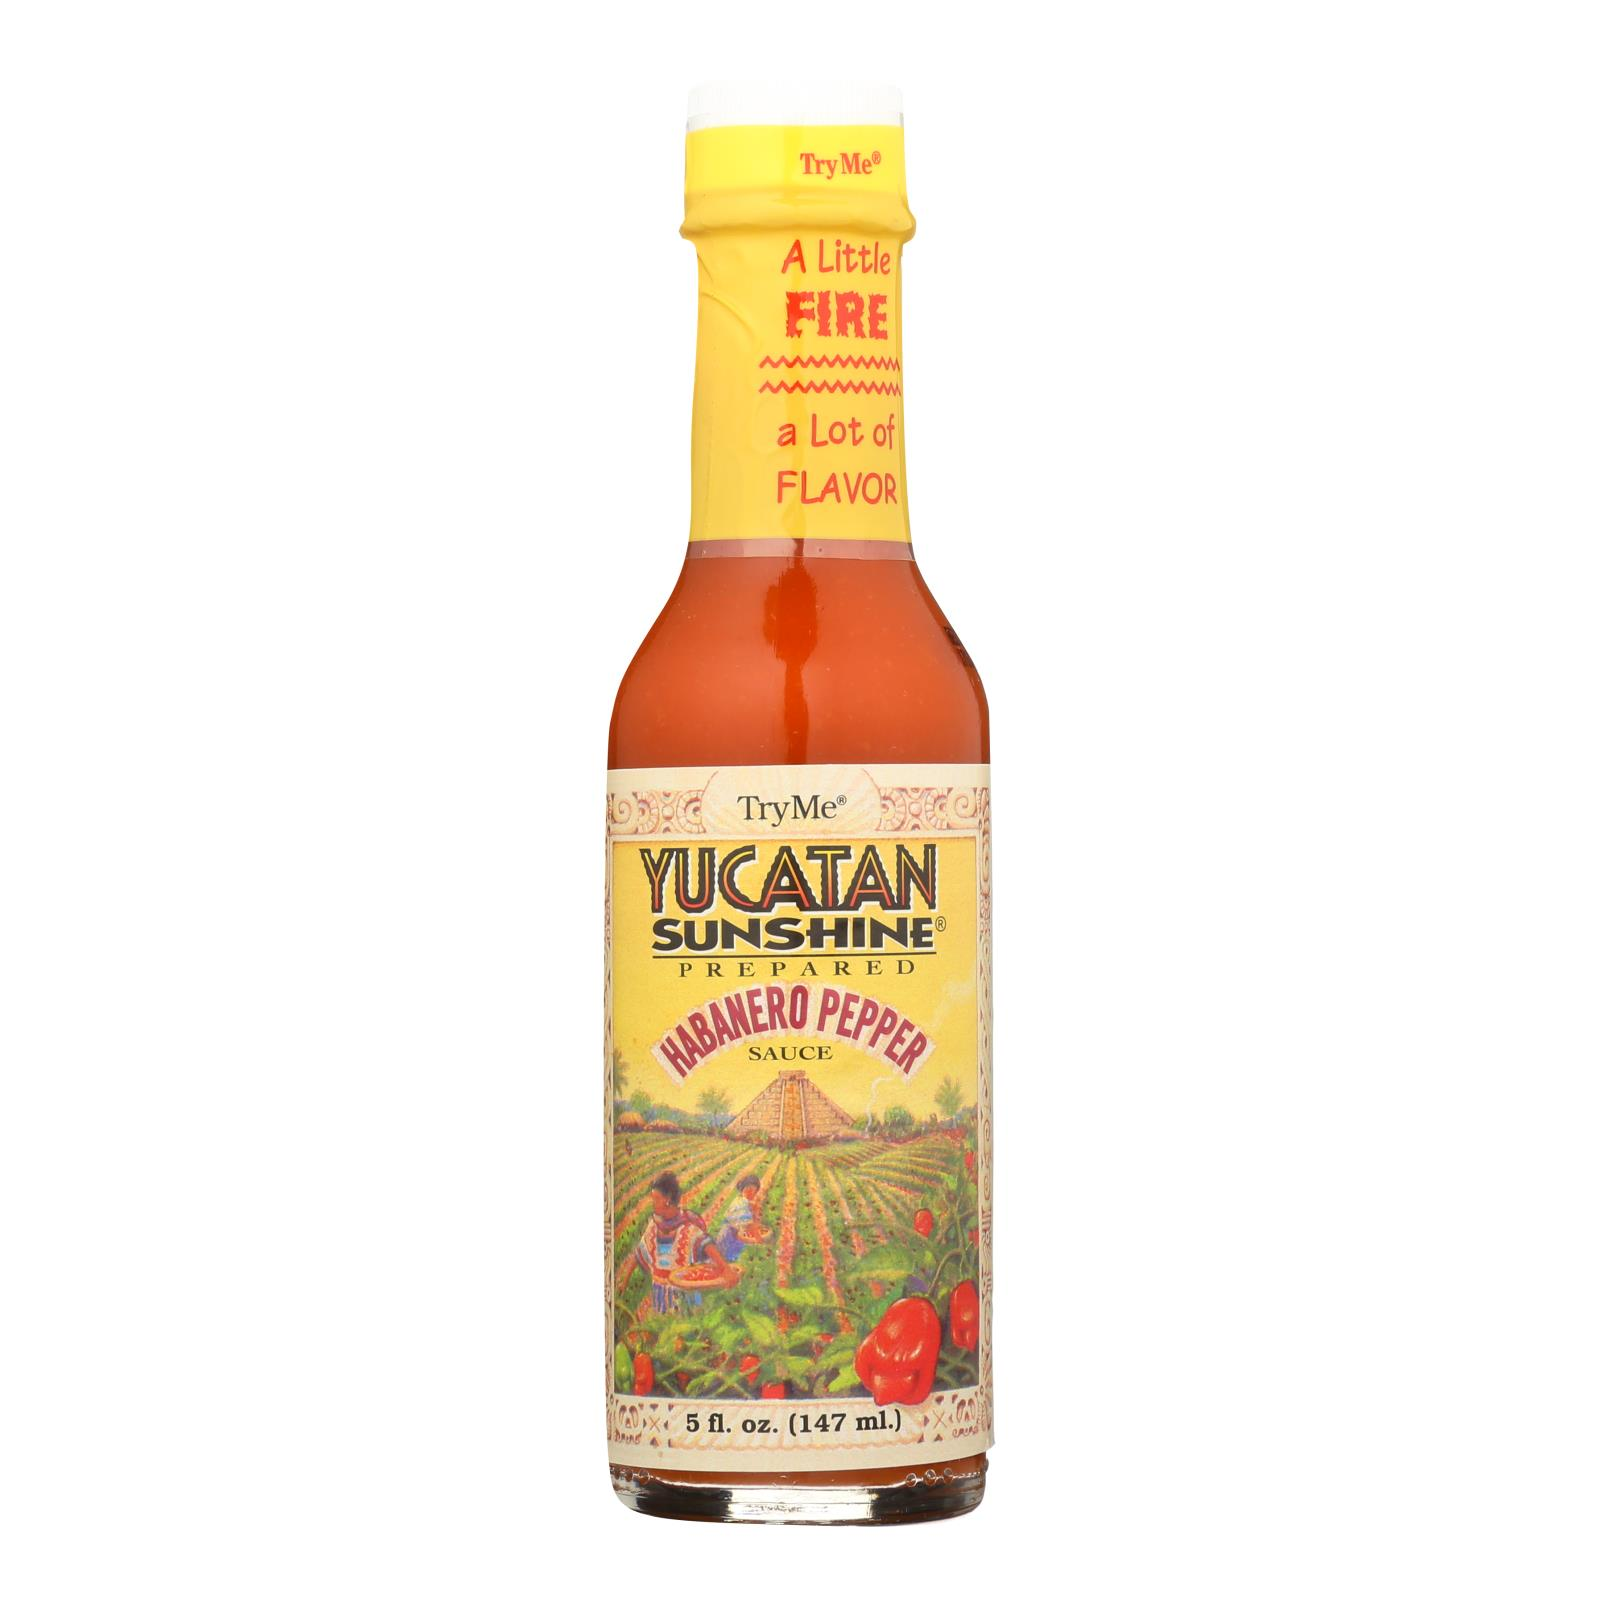 Try Me Yucatan Sunshine - Habanero Pepper Sauce - Case of 6 - 5 Fl oz.